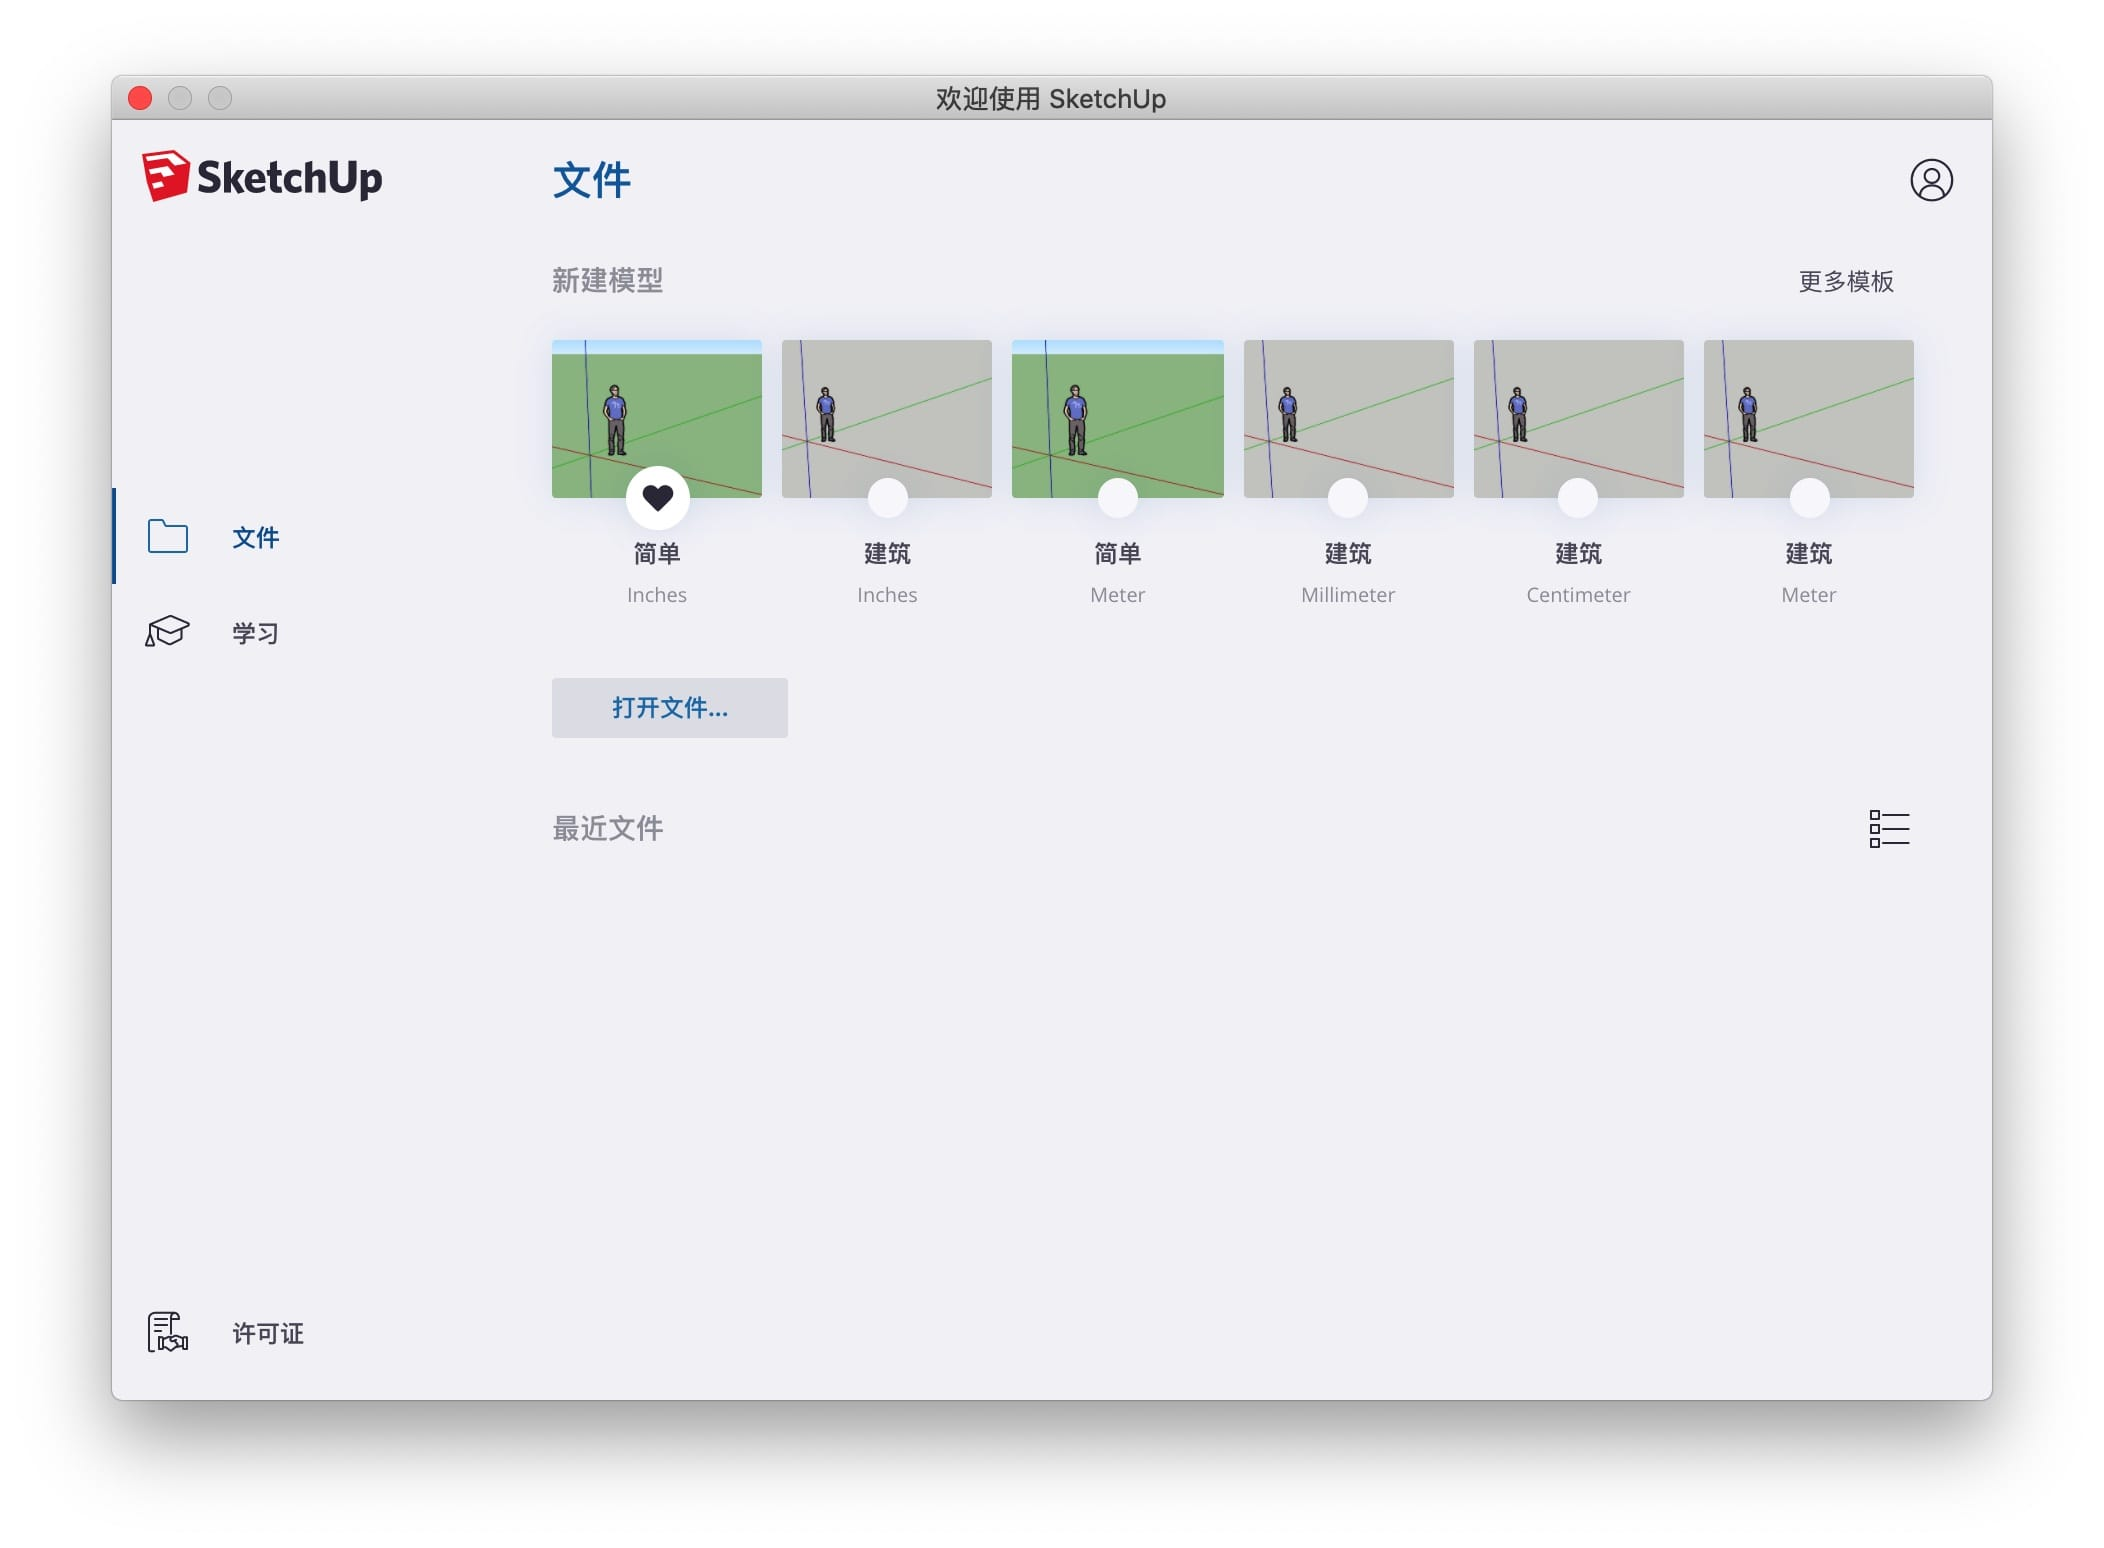 SketchUp Pro 2020 20.0.362 fixed 中文破解版 极受欢迎的3D设计软件 3D设计 第2张